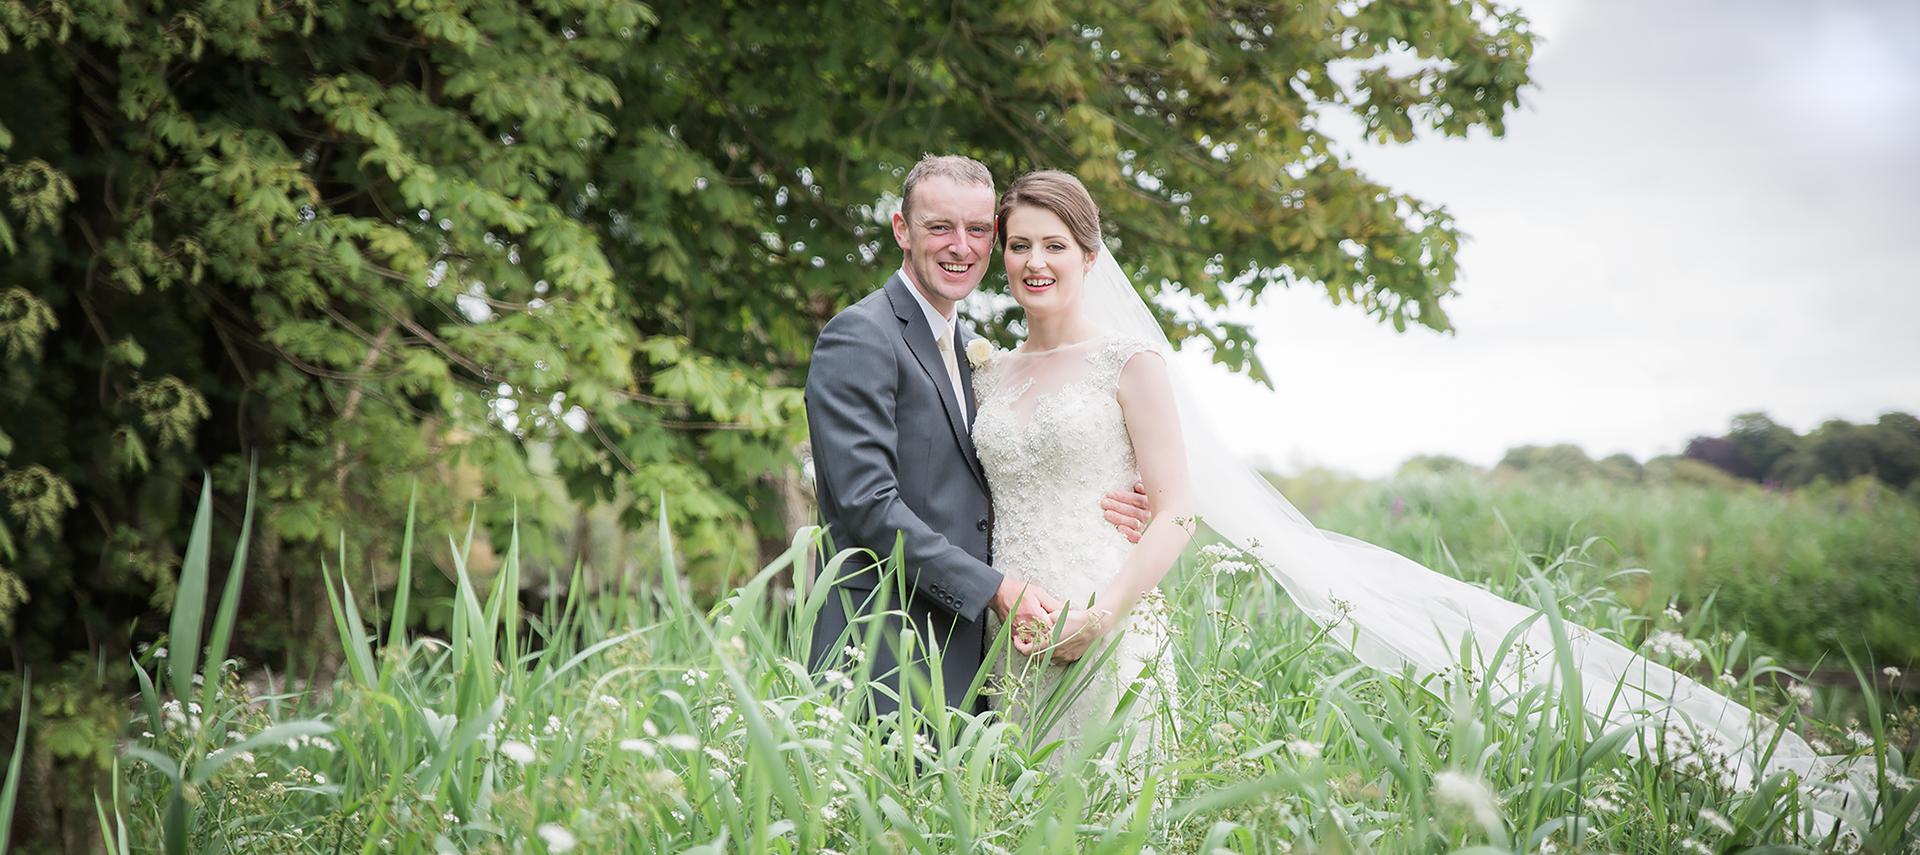 philippe gosseau, bridal party, bride, groom, wedding